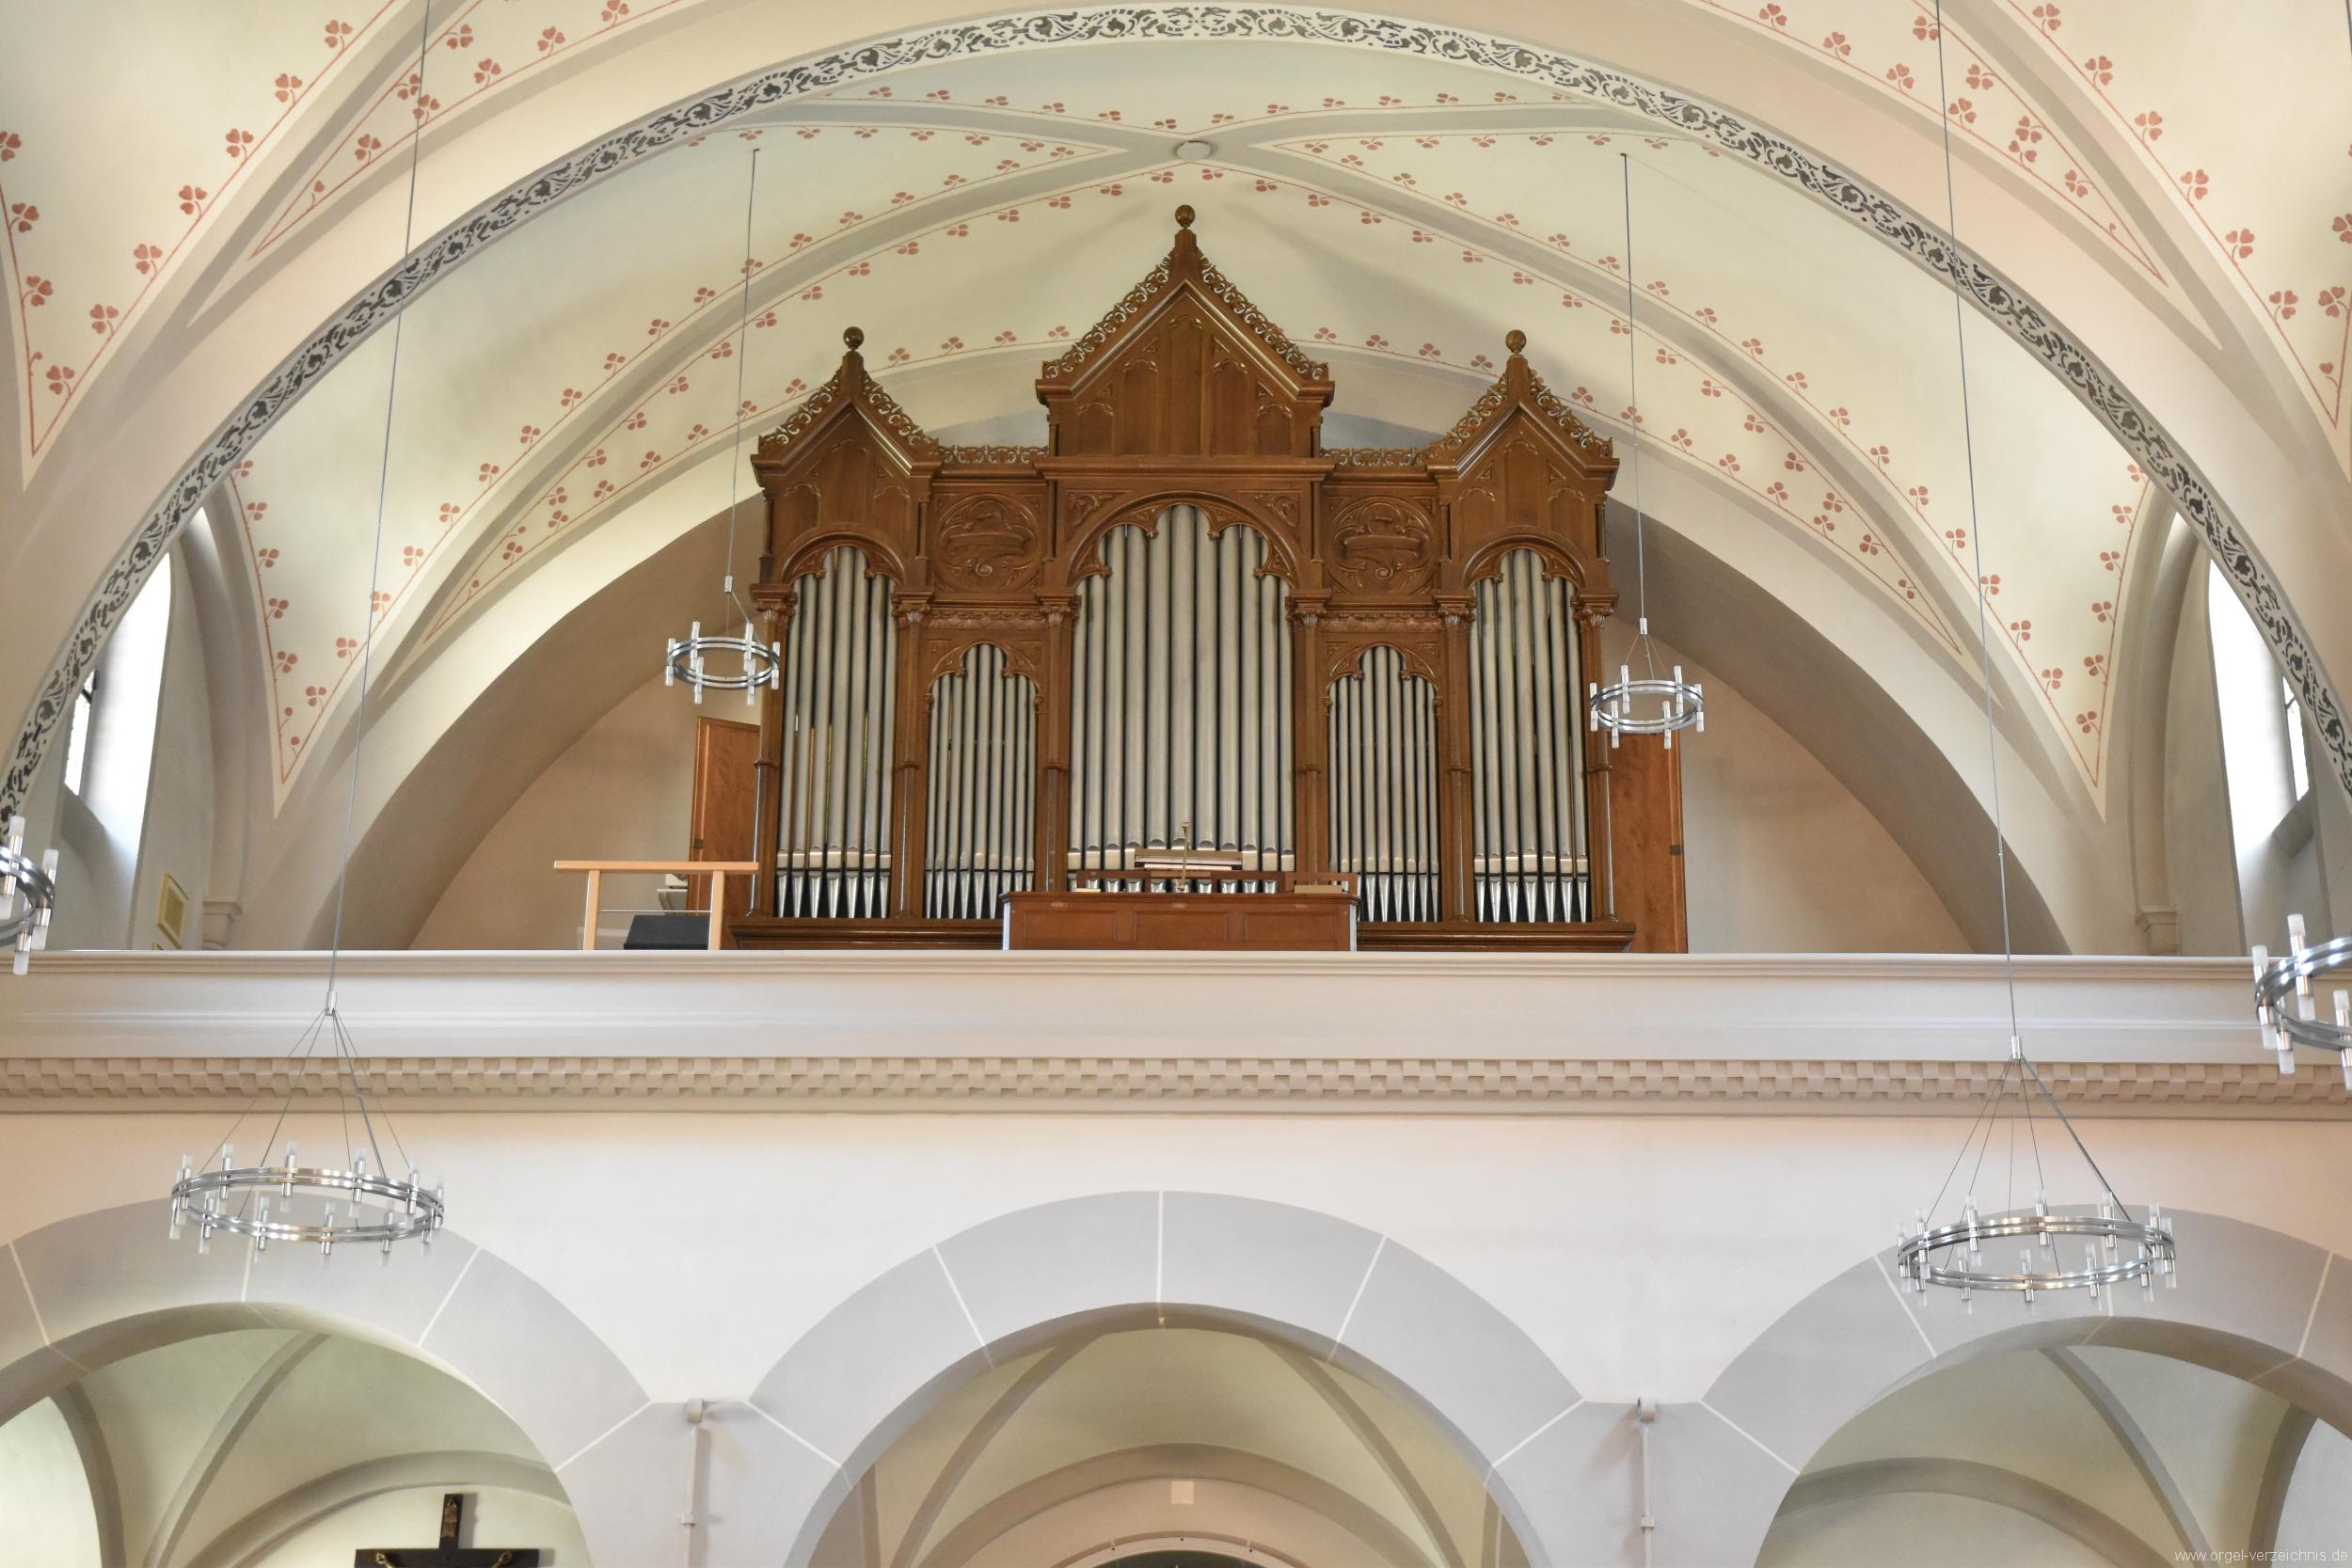 Göschenen St. Mariä Himmelfahrt Orgelprospekt I